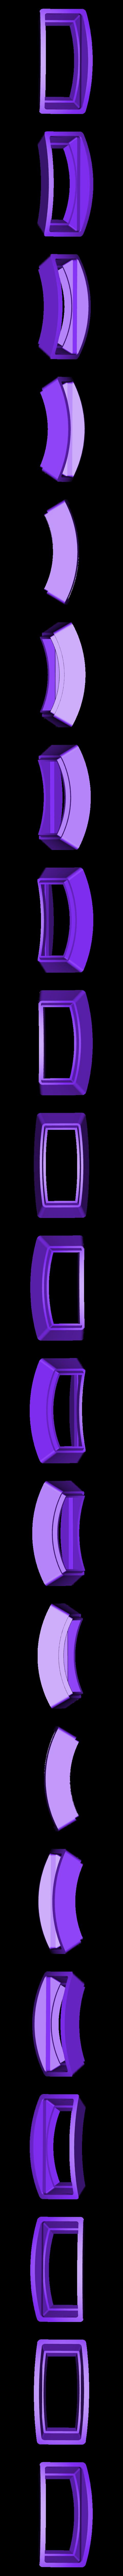 WHITE_PRINT.stl Download free STL file Water Melon Pill Box • 3D printer object, NormallyBen